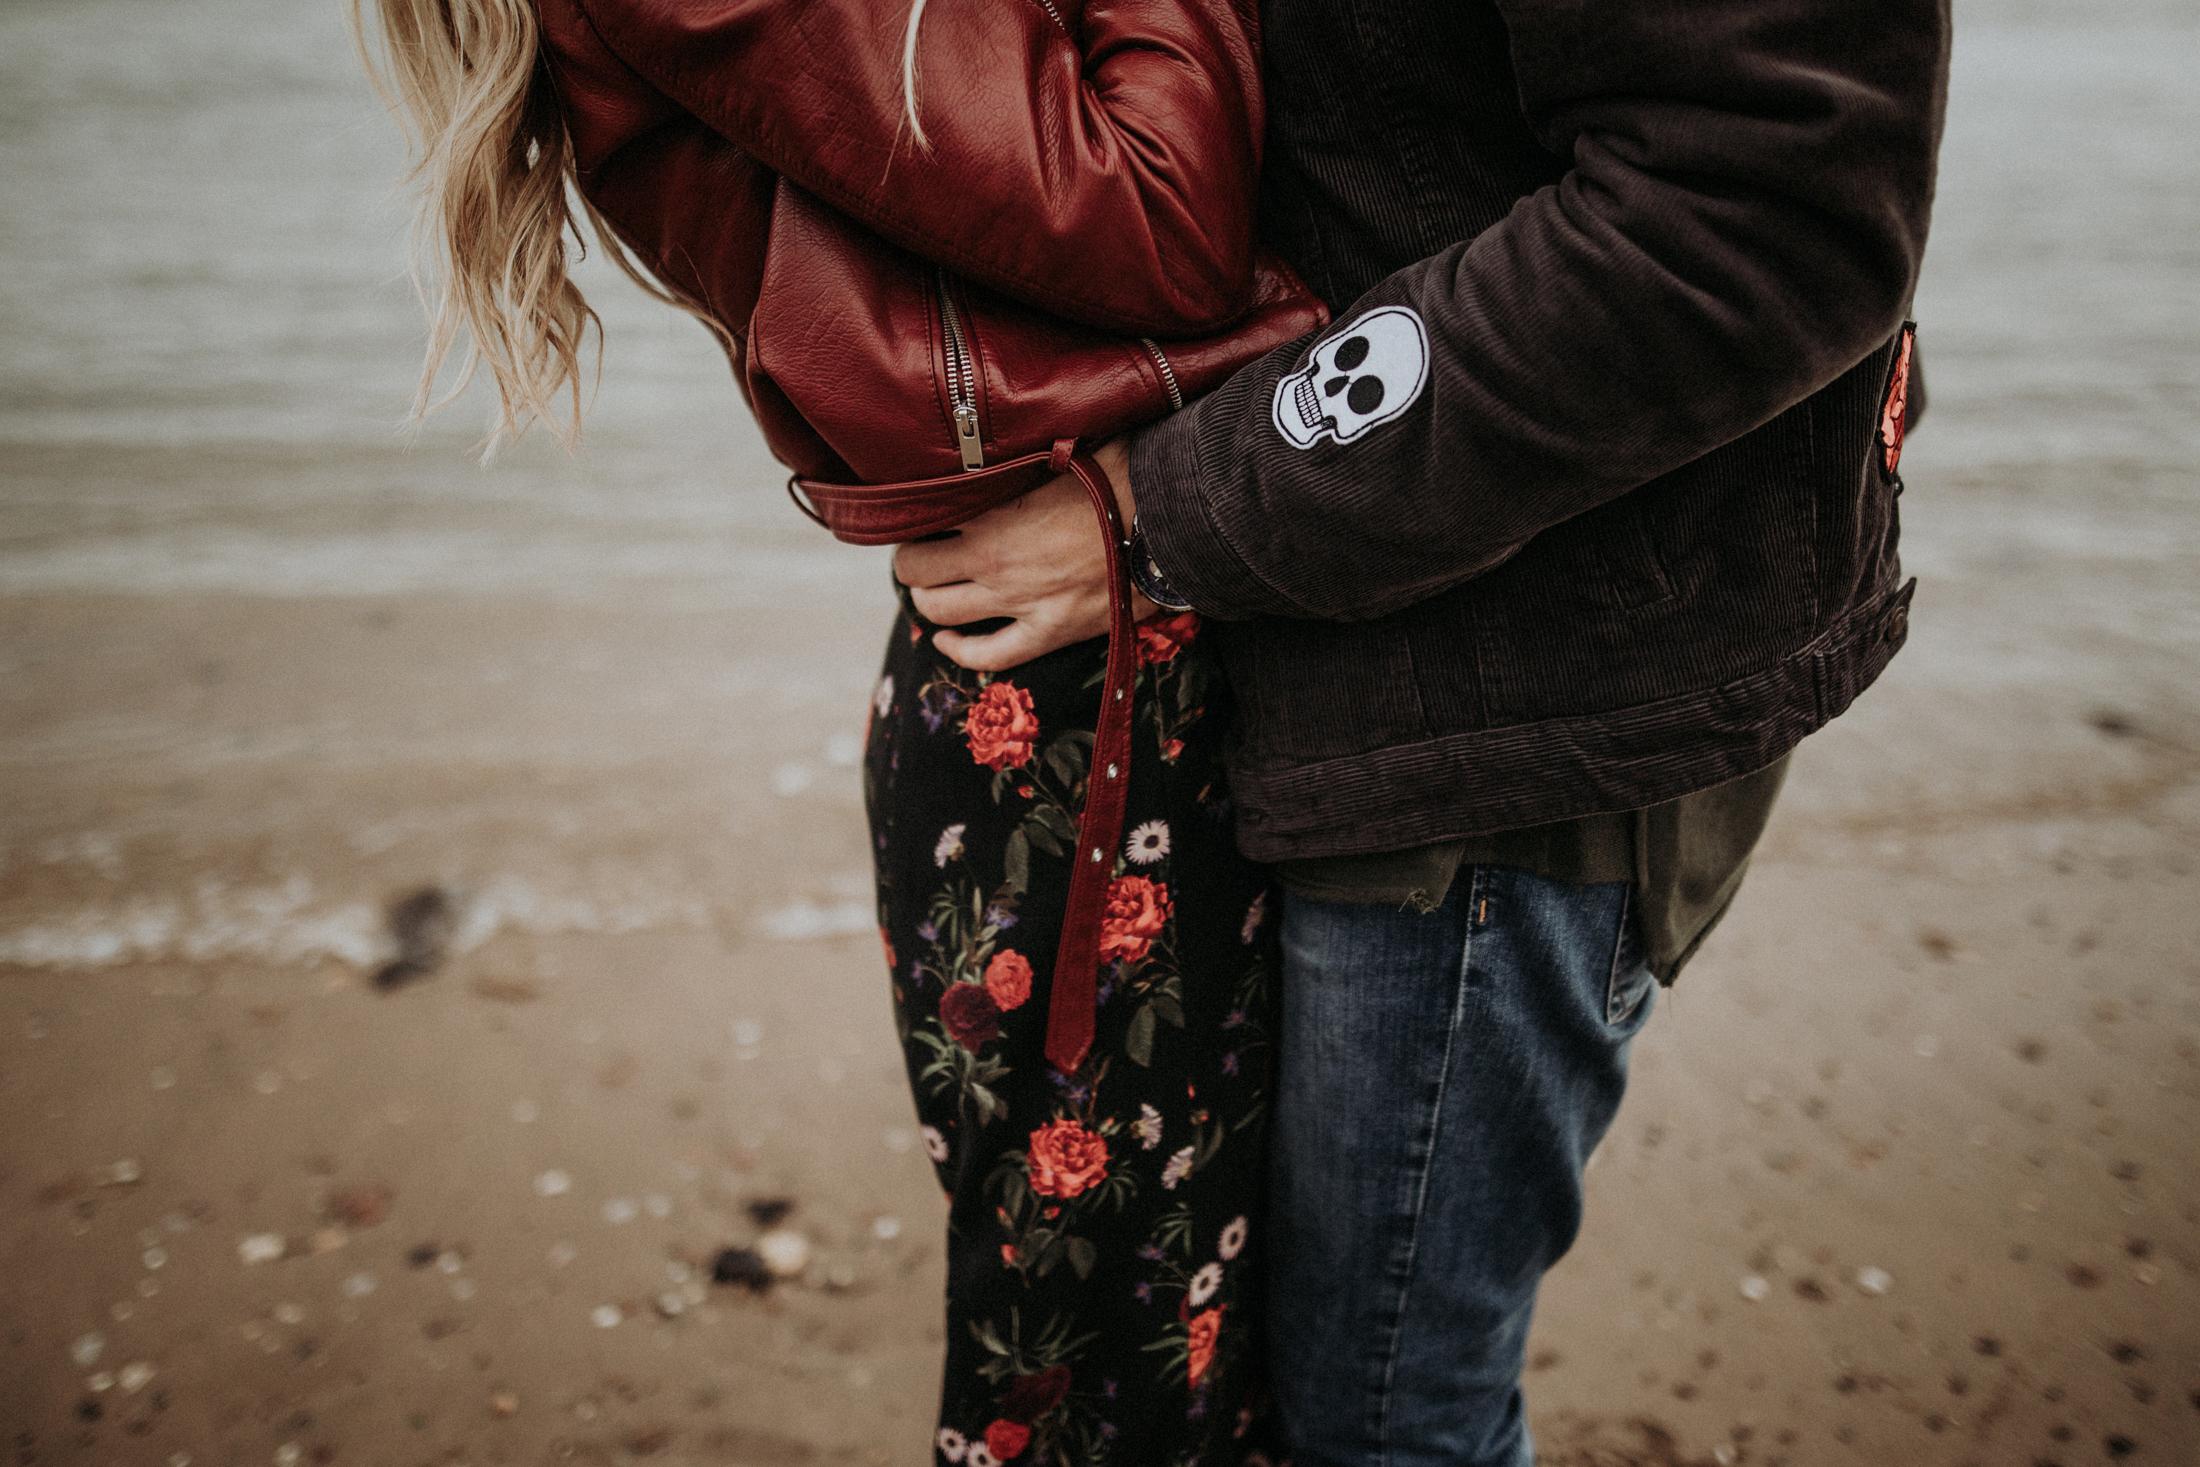 Wedding_Photographer_Mallorca_DanielaMarquardt_Photography_CanaryIslands_Lanzarote_Iceland_Tuscany_Santorini_Portugal_NewYork_Spain_Elopement_Hochzeitsfotograf_CK56